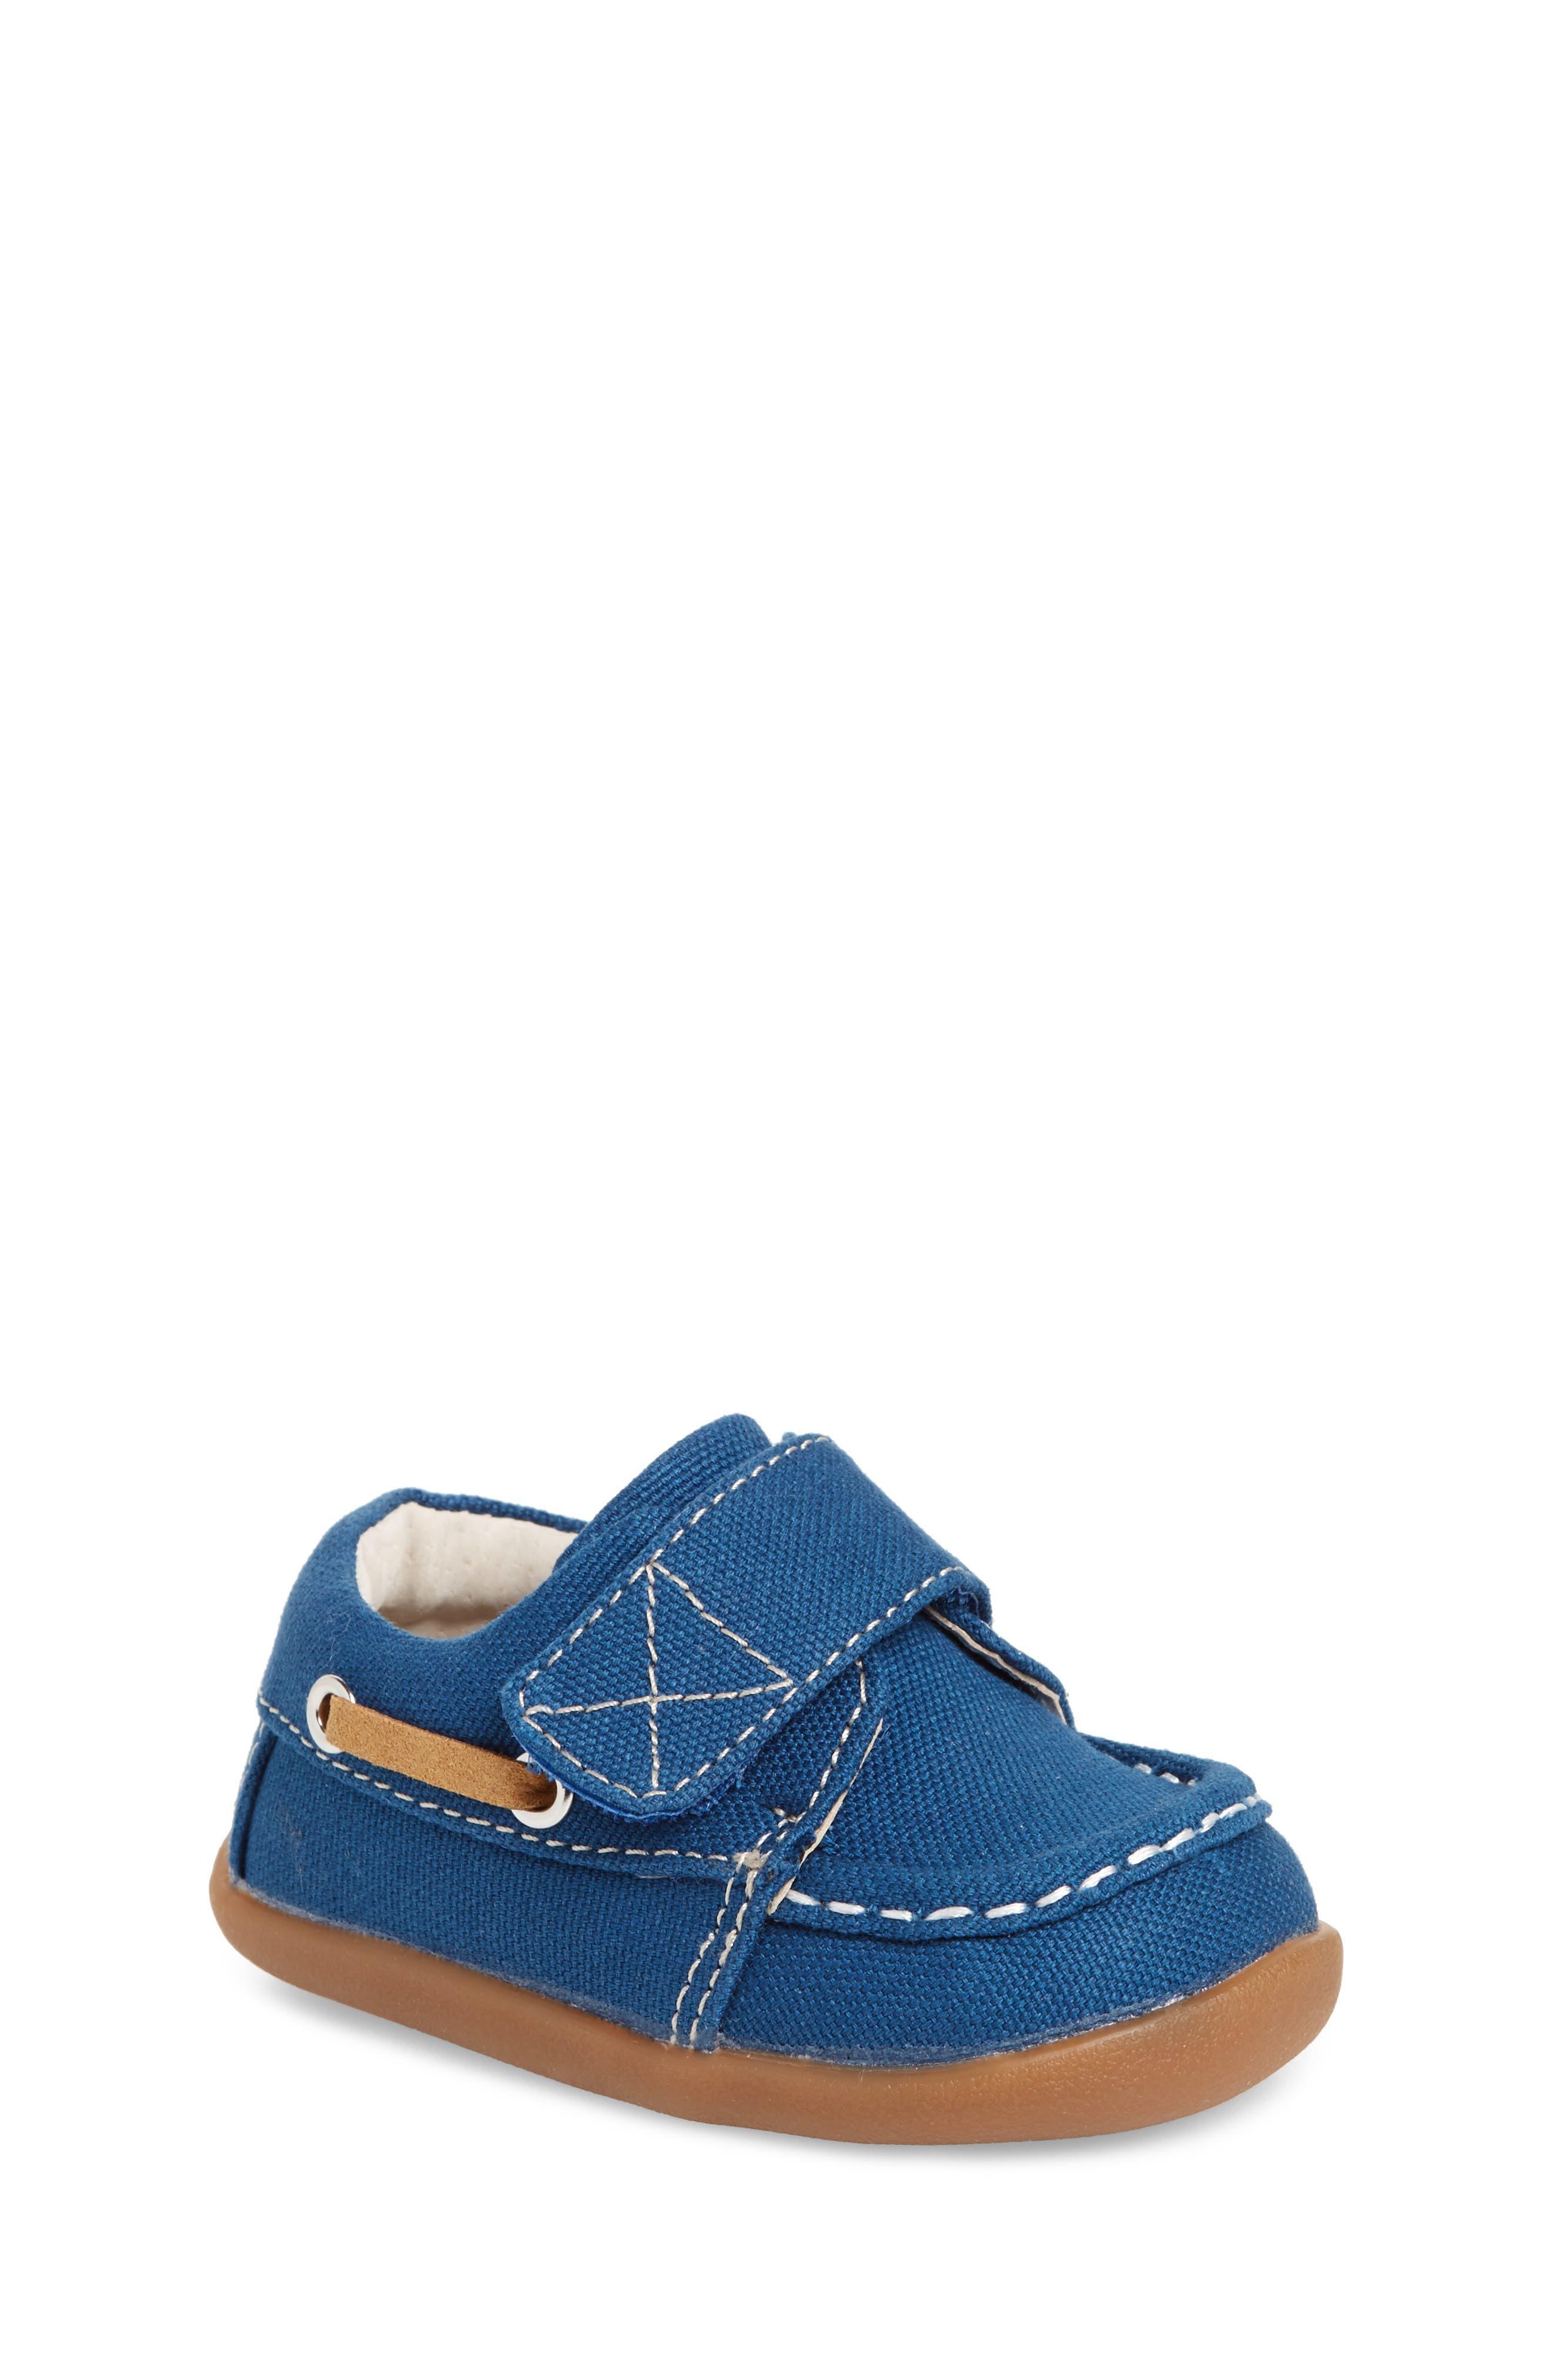 Arthur Sneaker,                             Main thumbnail 1, color,                             BLUE CANVAS